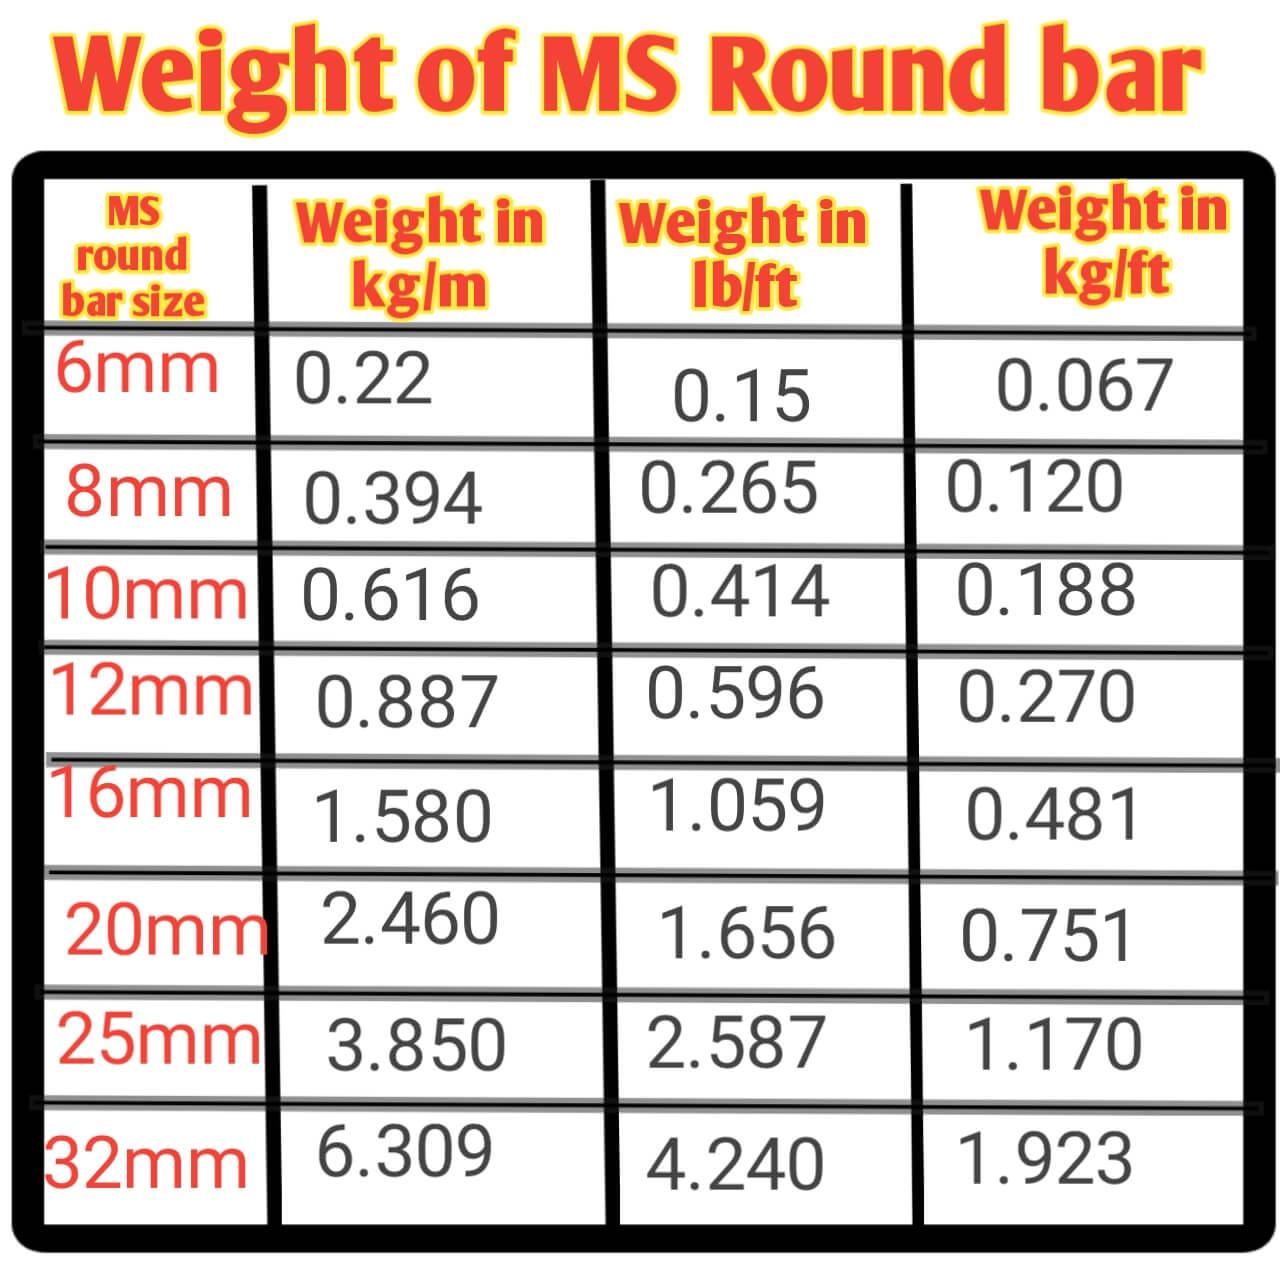 Weight of MS round bar chart